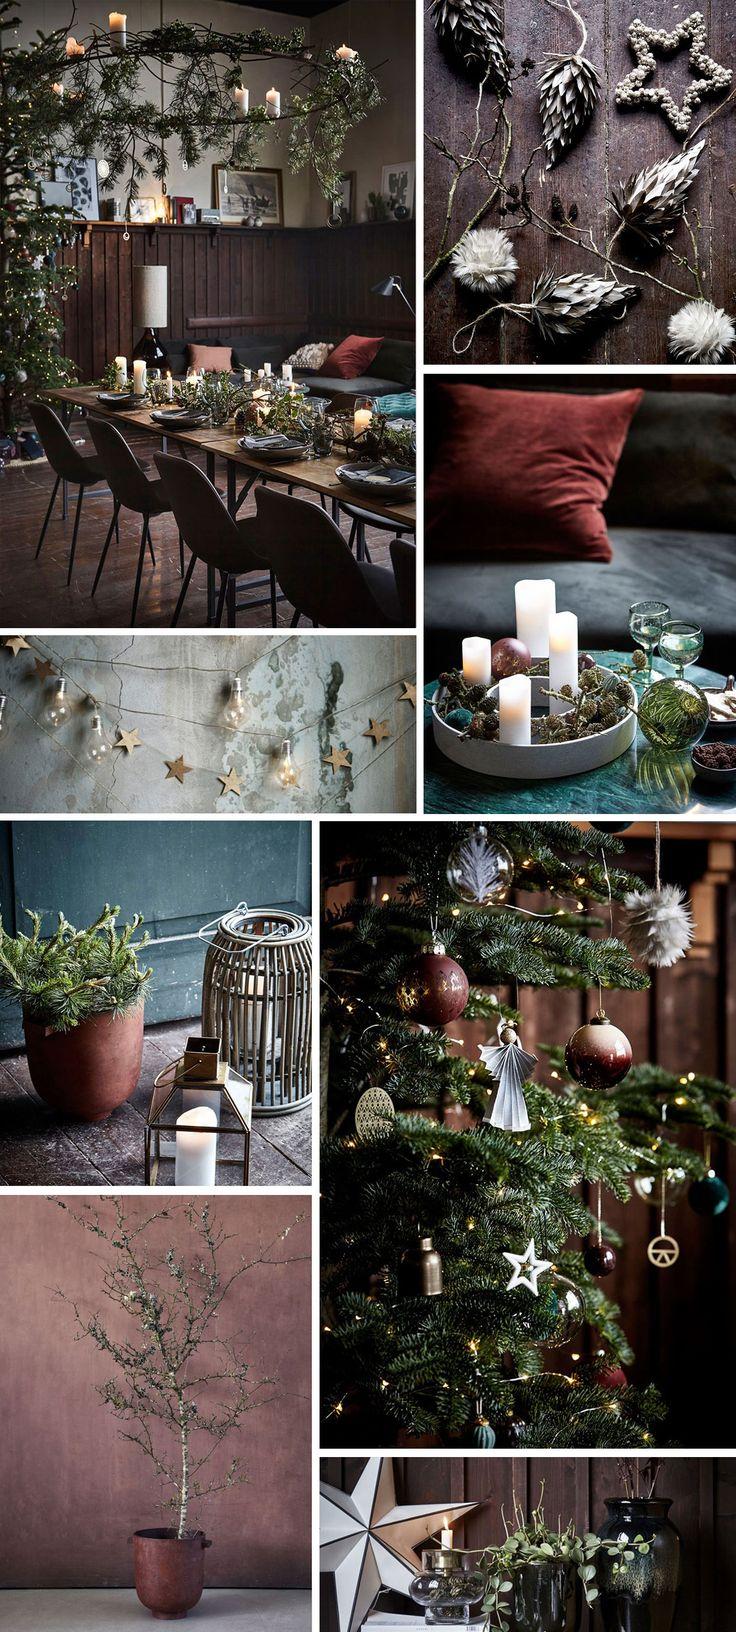 Holiday decor inspiration | Nordicdesign #christmas #decor #holidaydecor